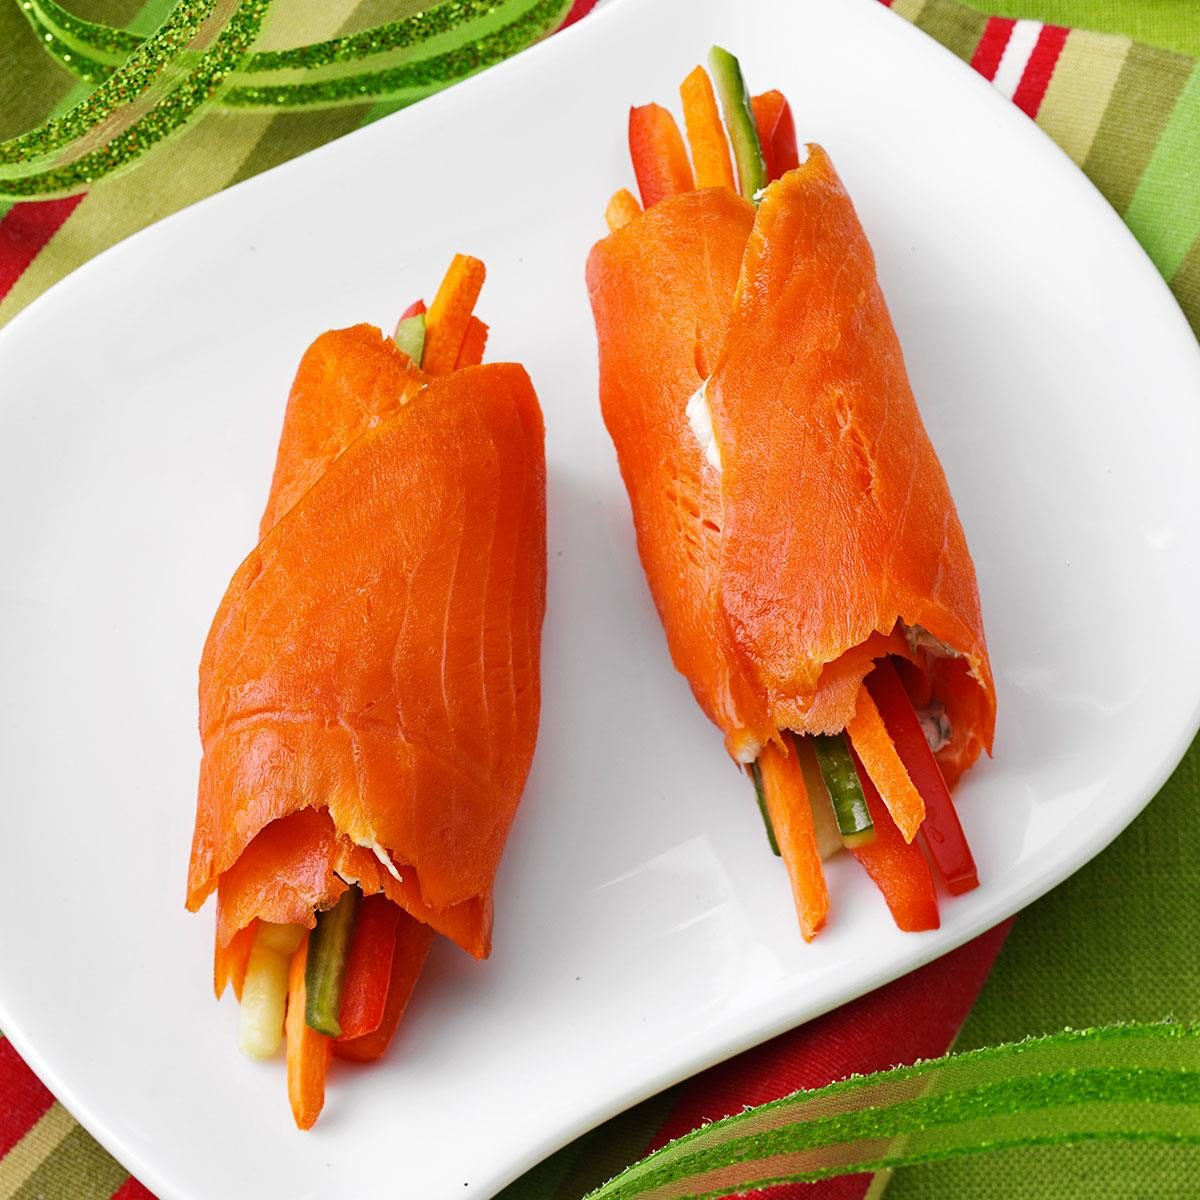 how to make smoked carrot that looks like smoked salmon